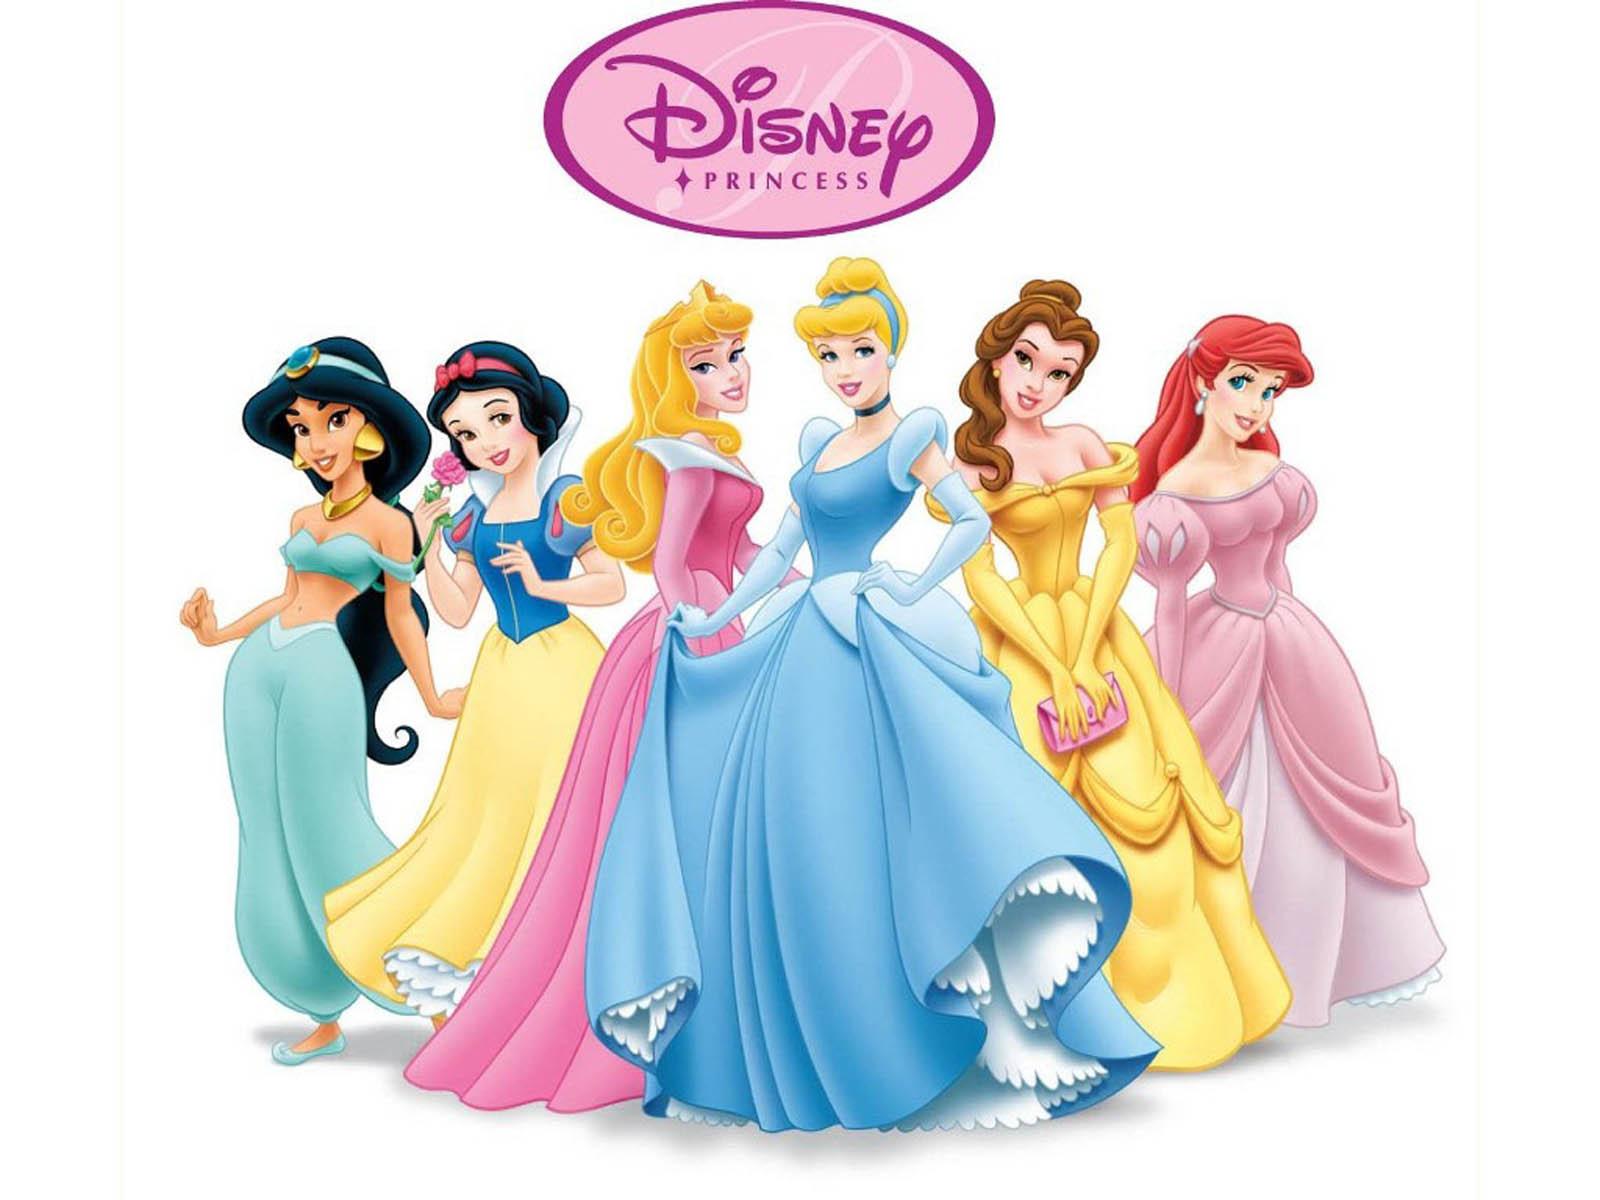 HD Quality Wallpaper | Collection: Cartoon, 1600x1200 Disney Princesses